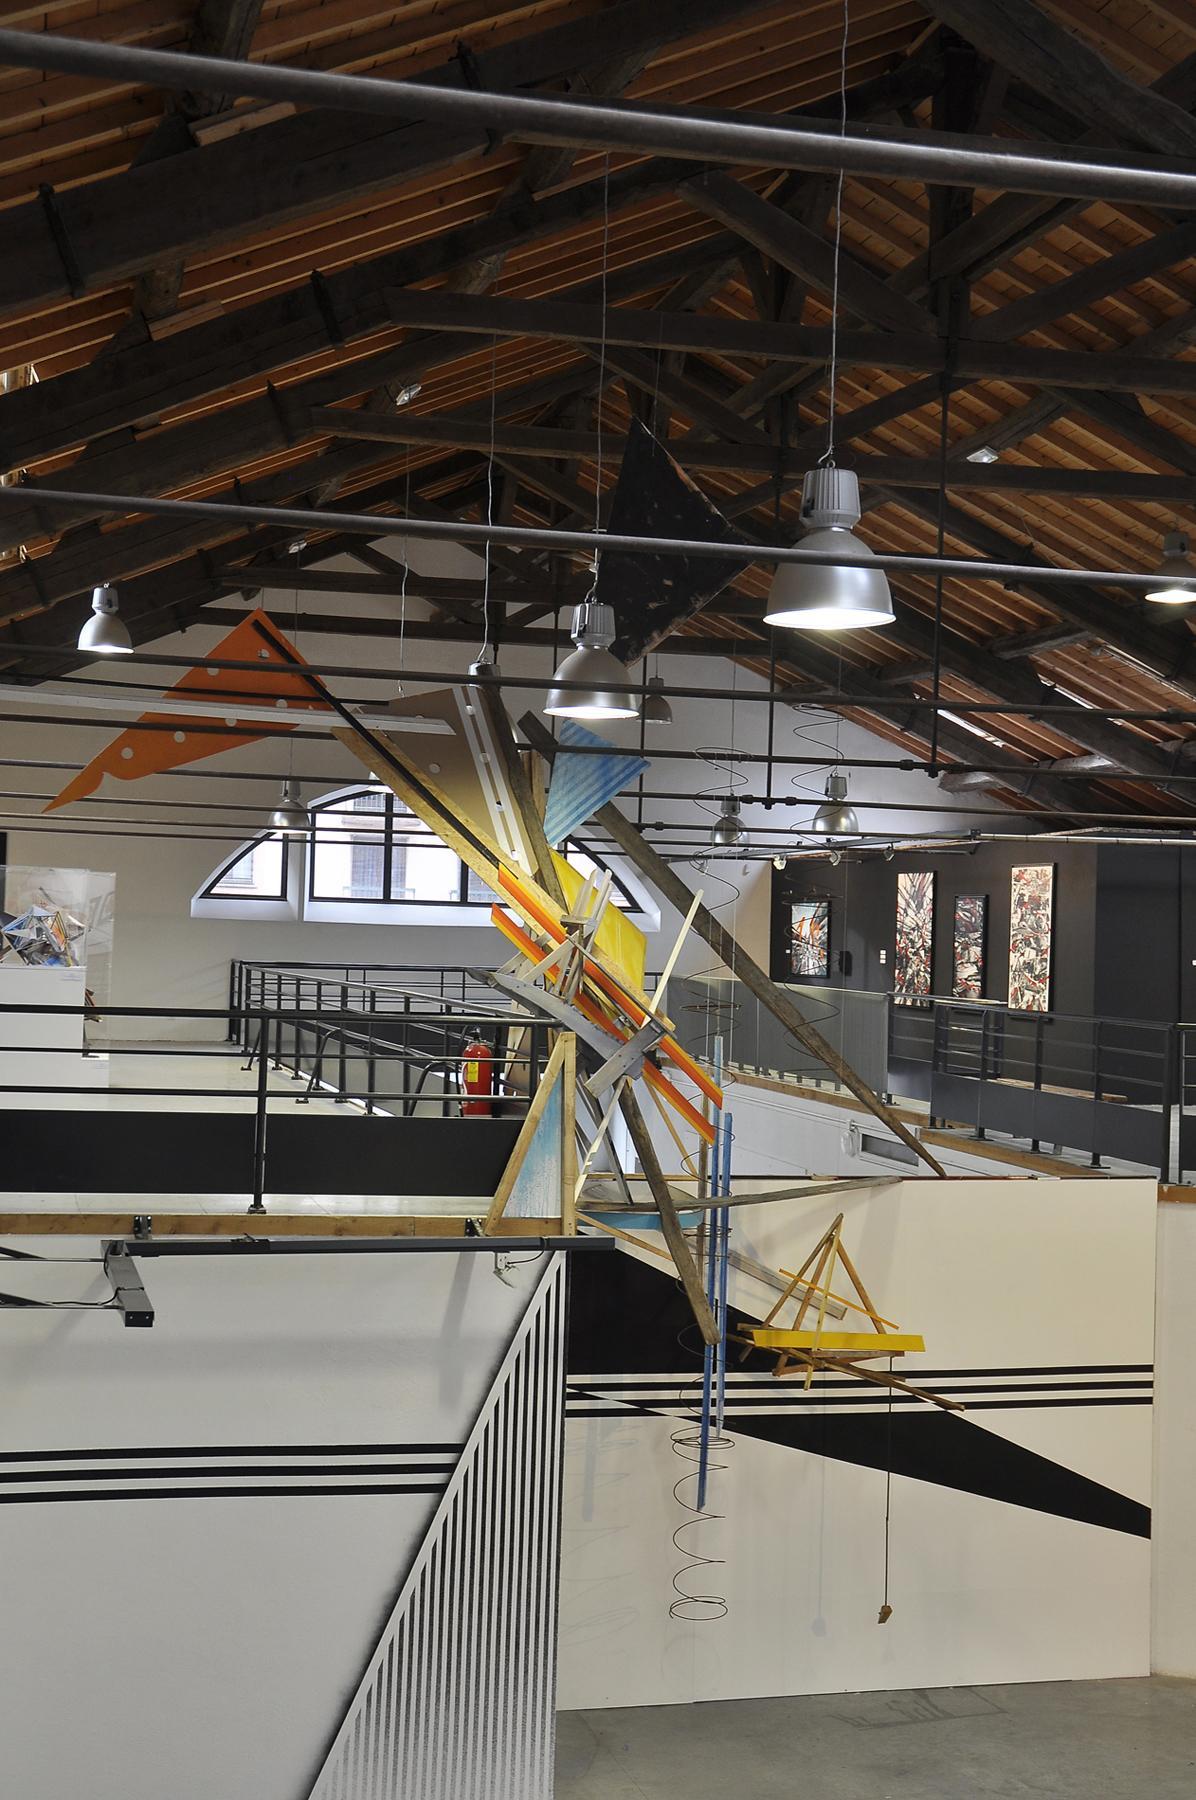 installation gilbert1 manifeste urbain la lune parachute epinal street art artistik rezo paris